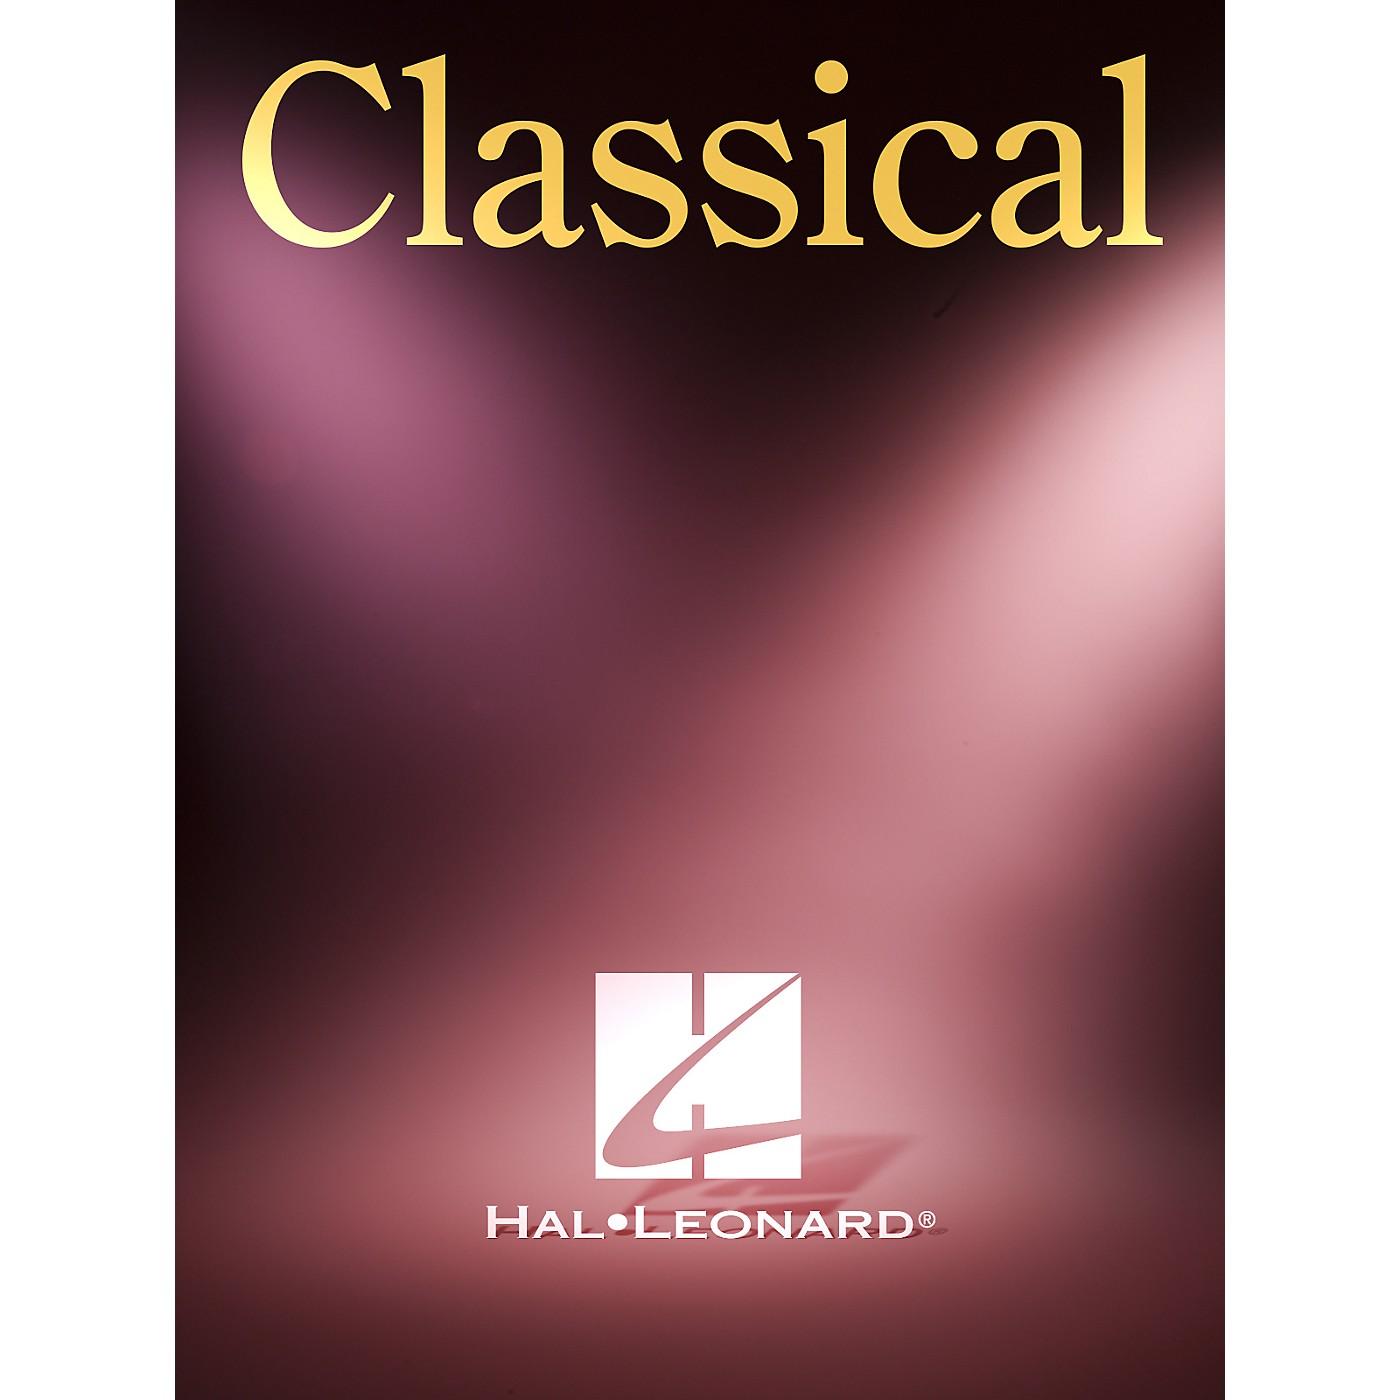 Hal Leonard Art Of The Fugue Suite Brass Quintet Brass Ensemble Series by Bach J S thumbnail